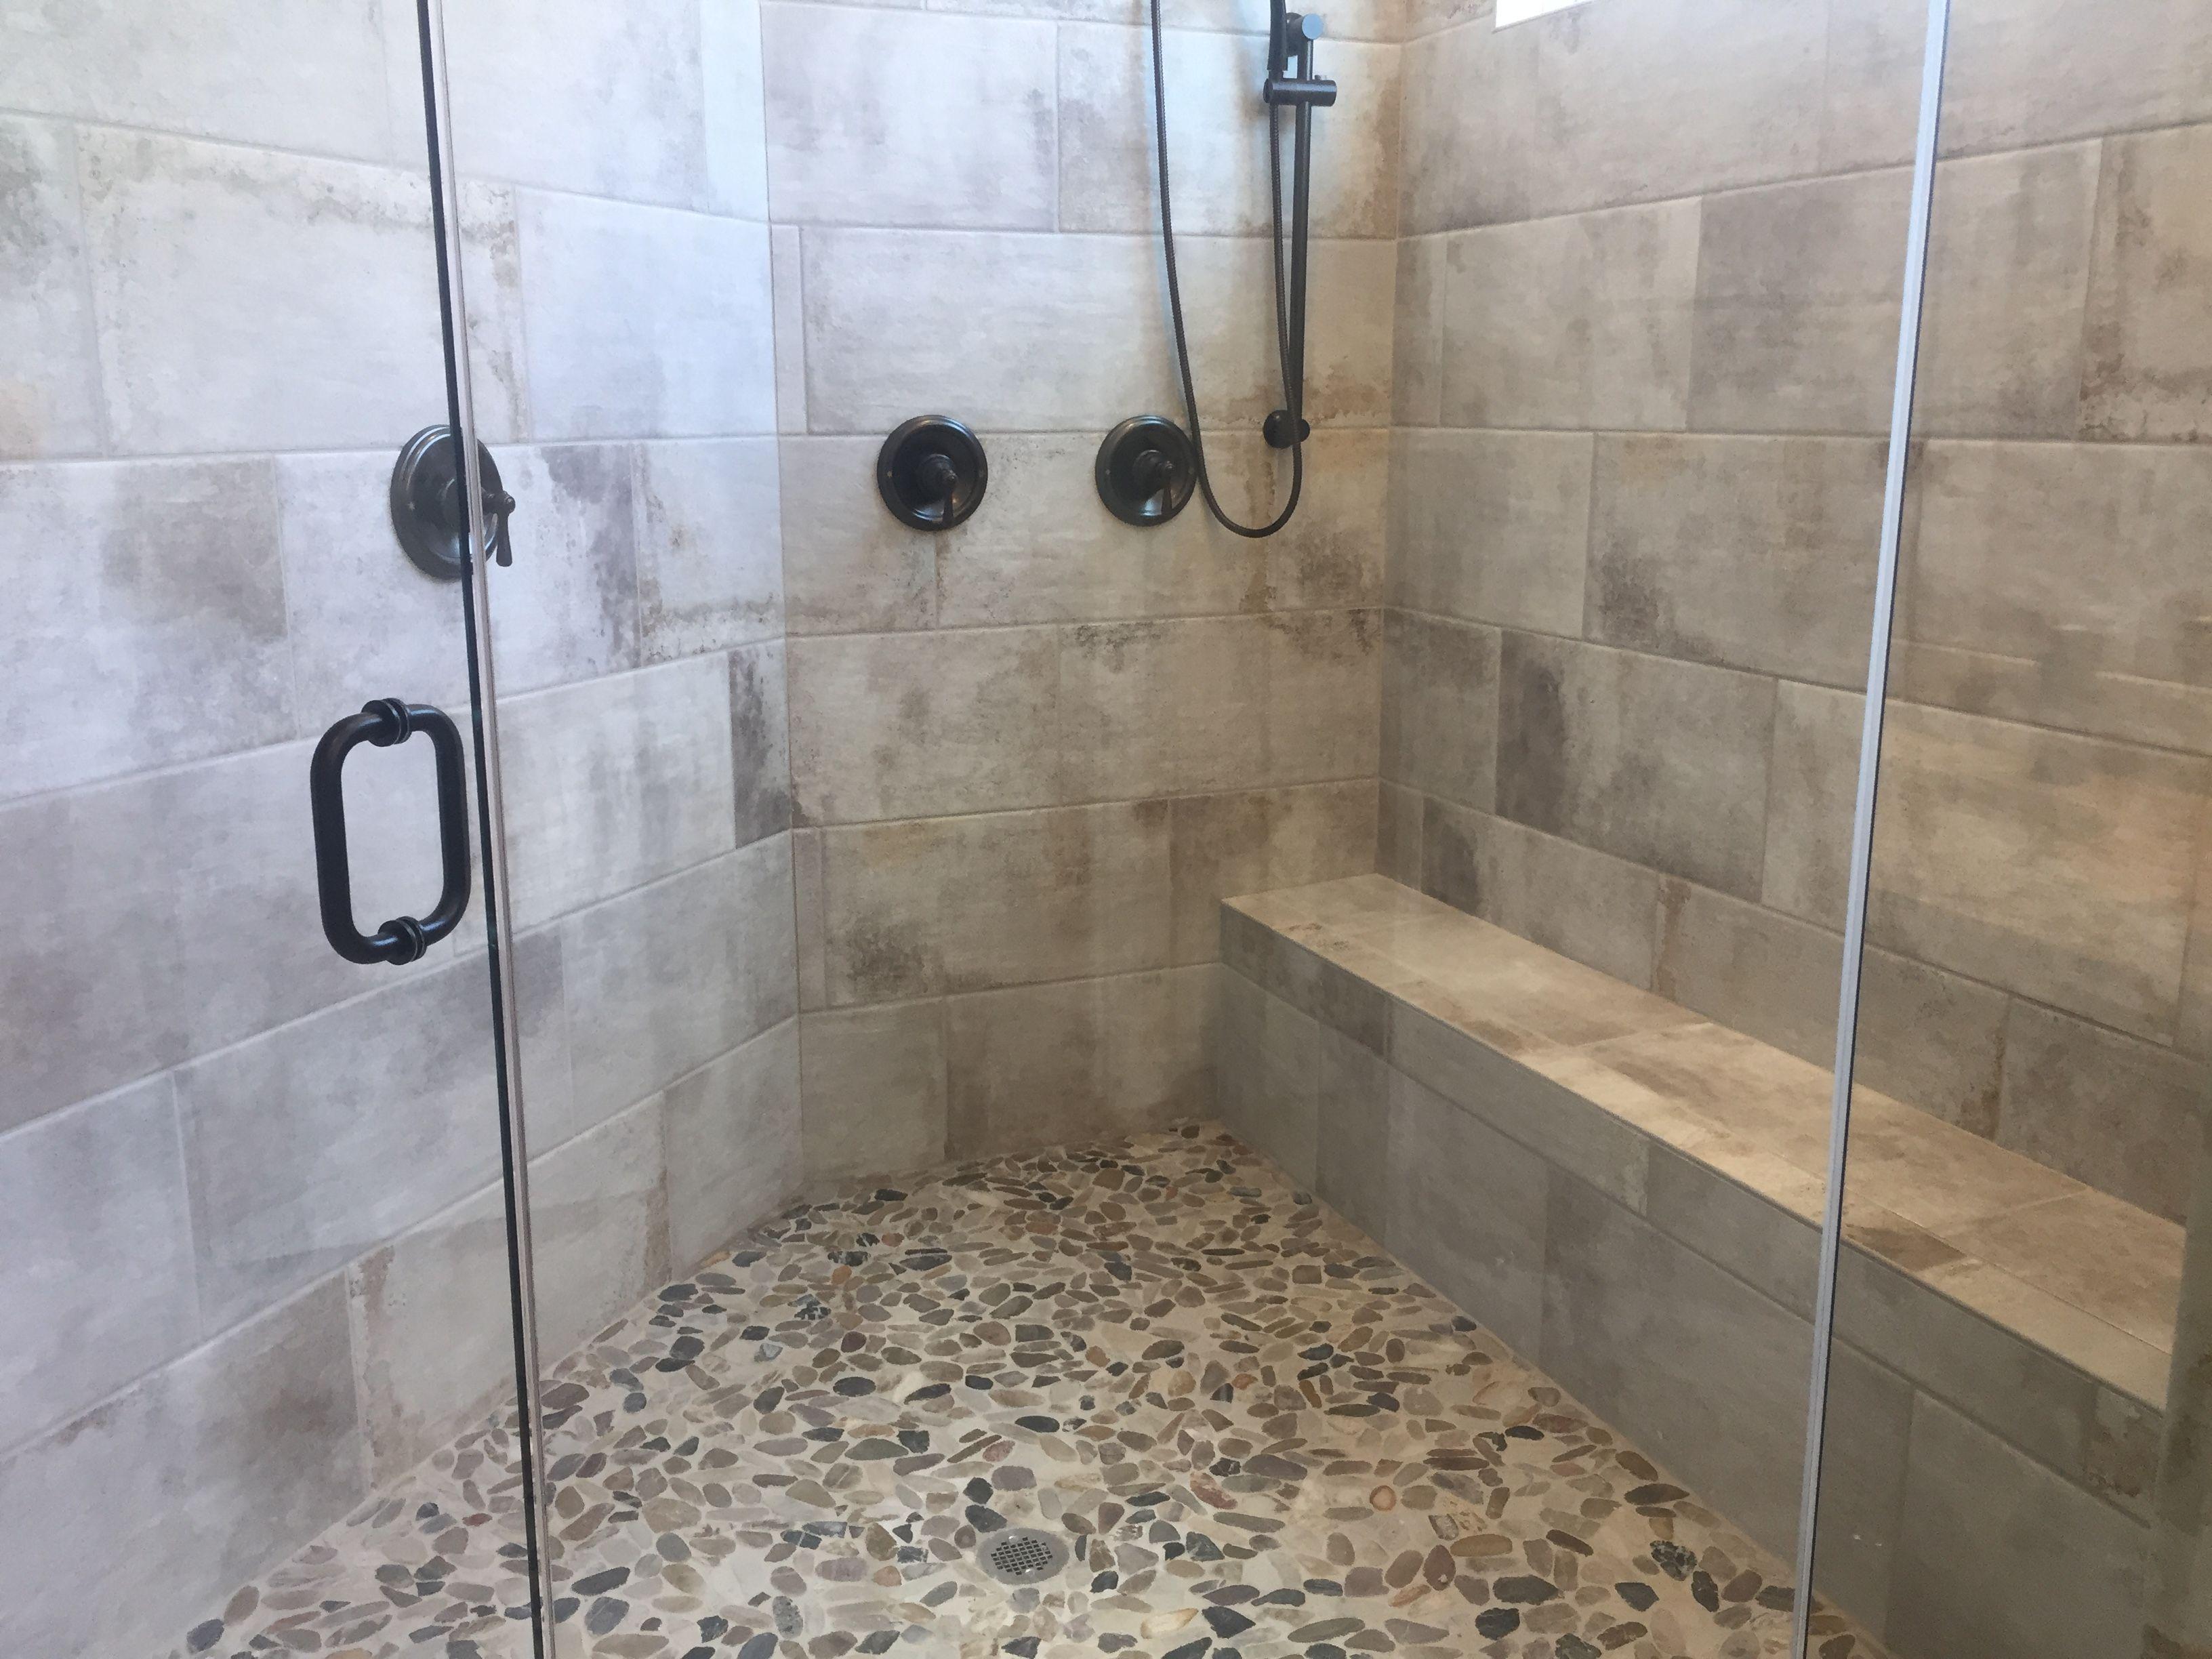 Cotto Contempo Pennsylvania Avenue 12x24 Wall Tile Installed Horizontal Brick Joint Brick Tiles Bathroom Bathroom Tub Tub Tile